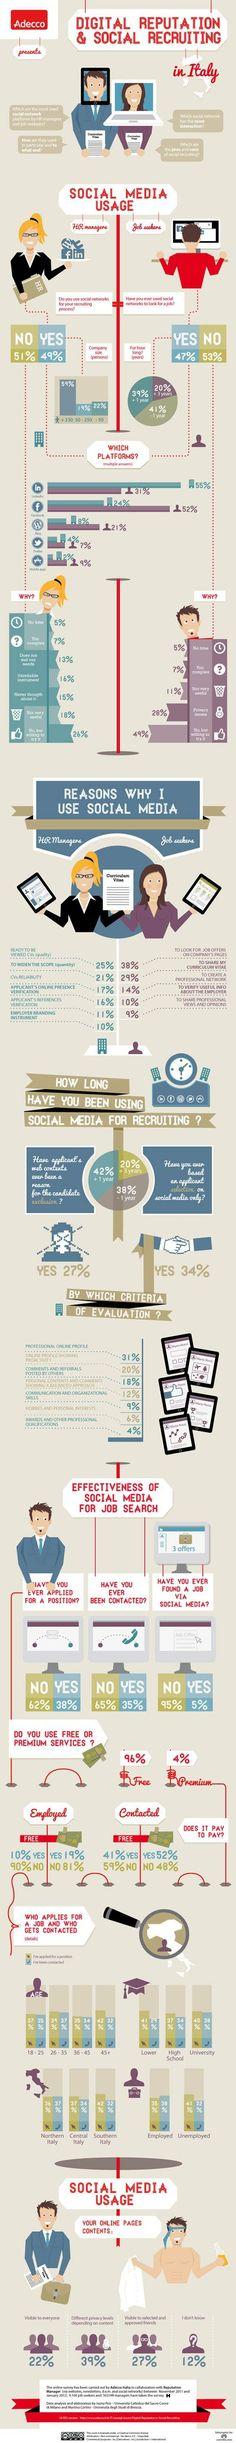 50 Recrutement Ideas Infographic Marketing Infographic Social Media